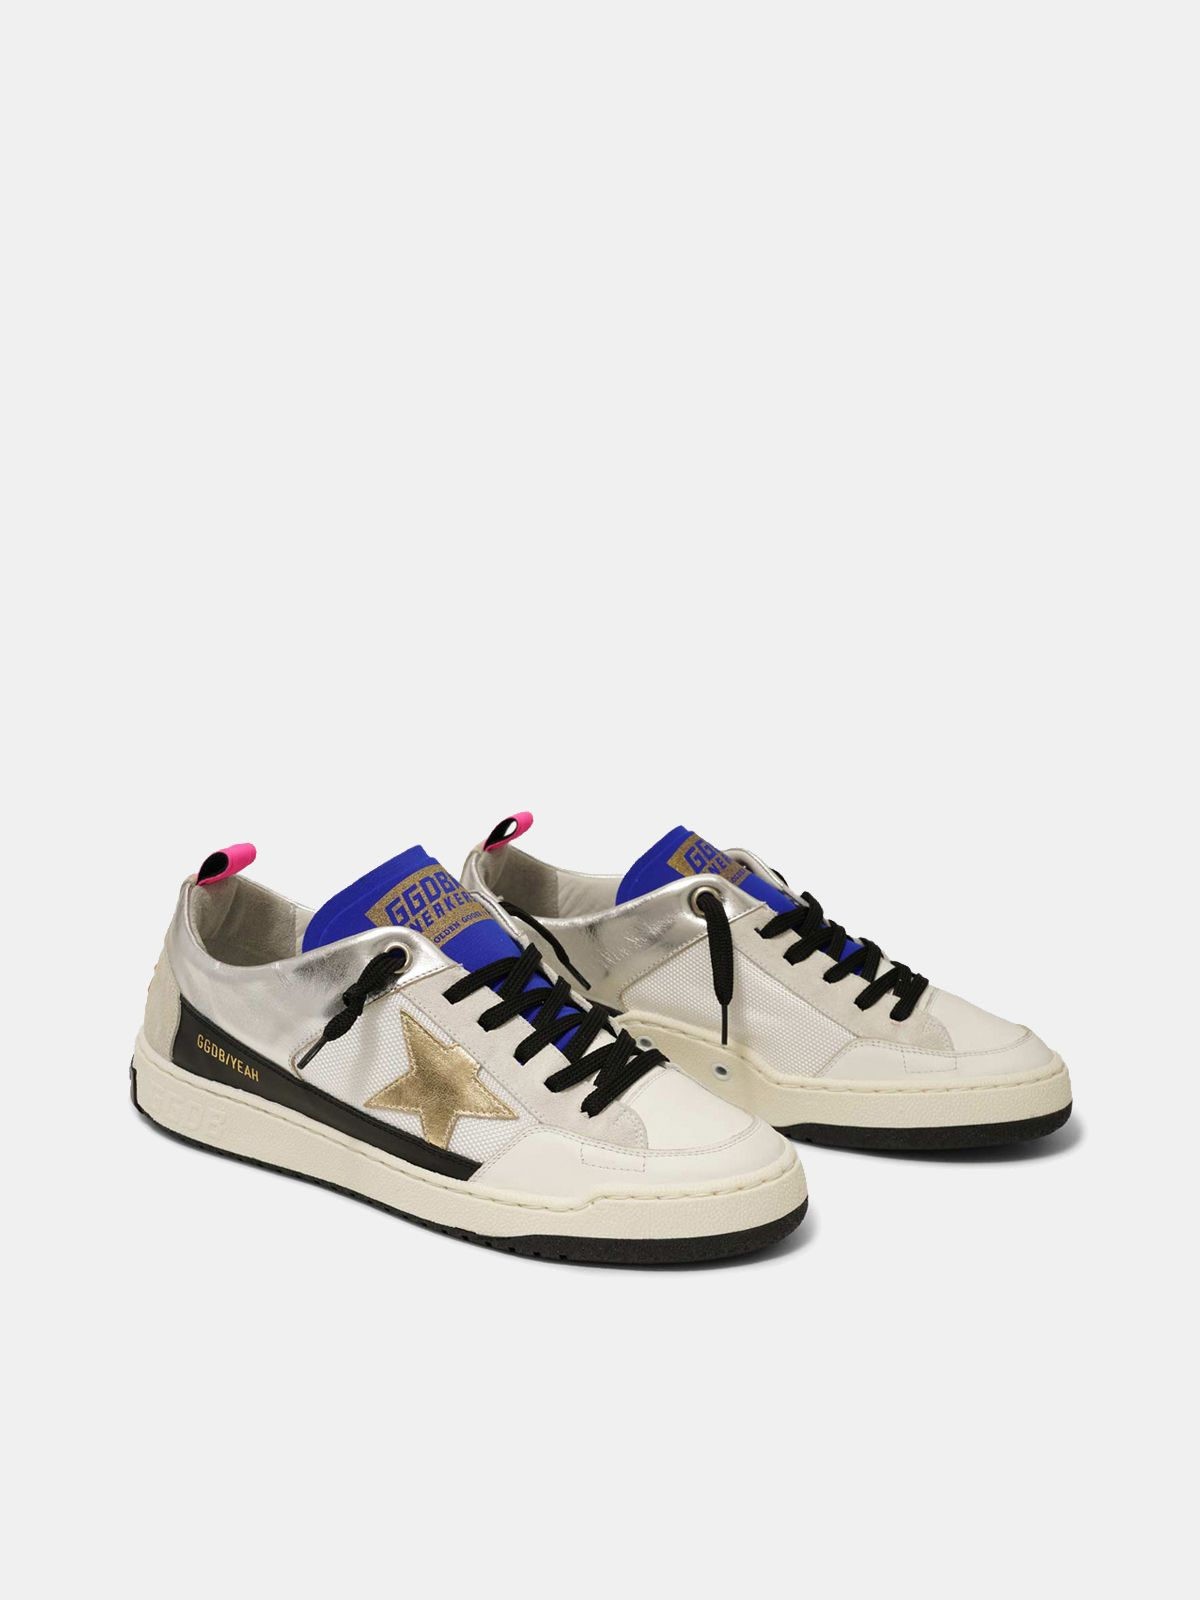 Golden Goose - Sneakers Yeah! bianche con stella dorata in